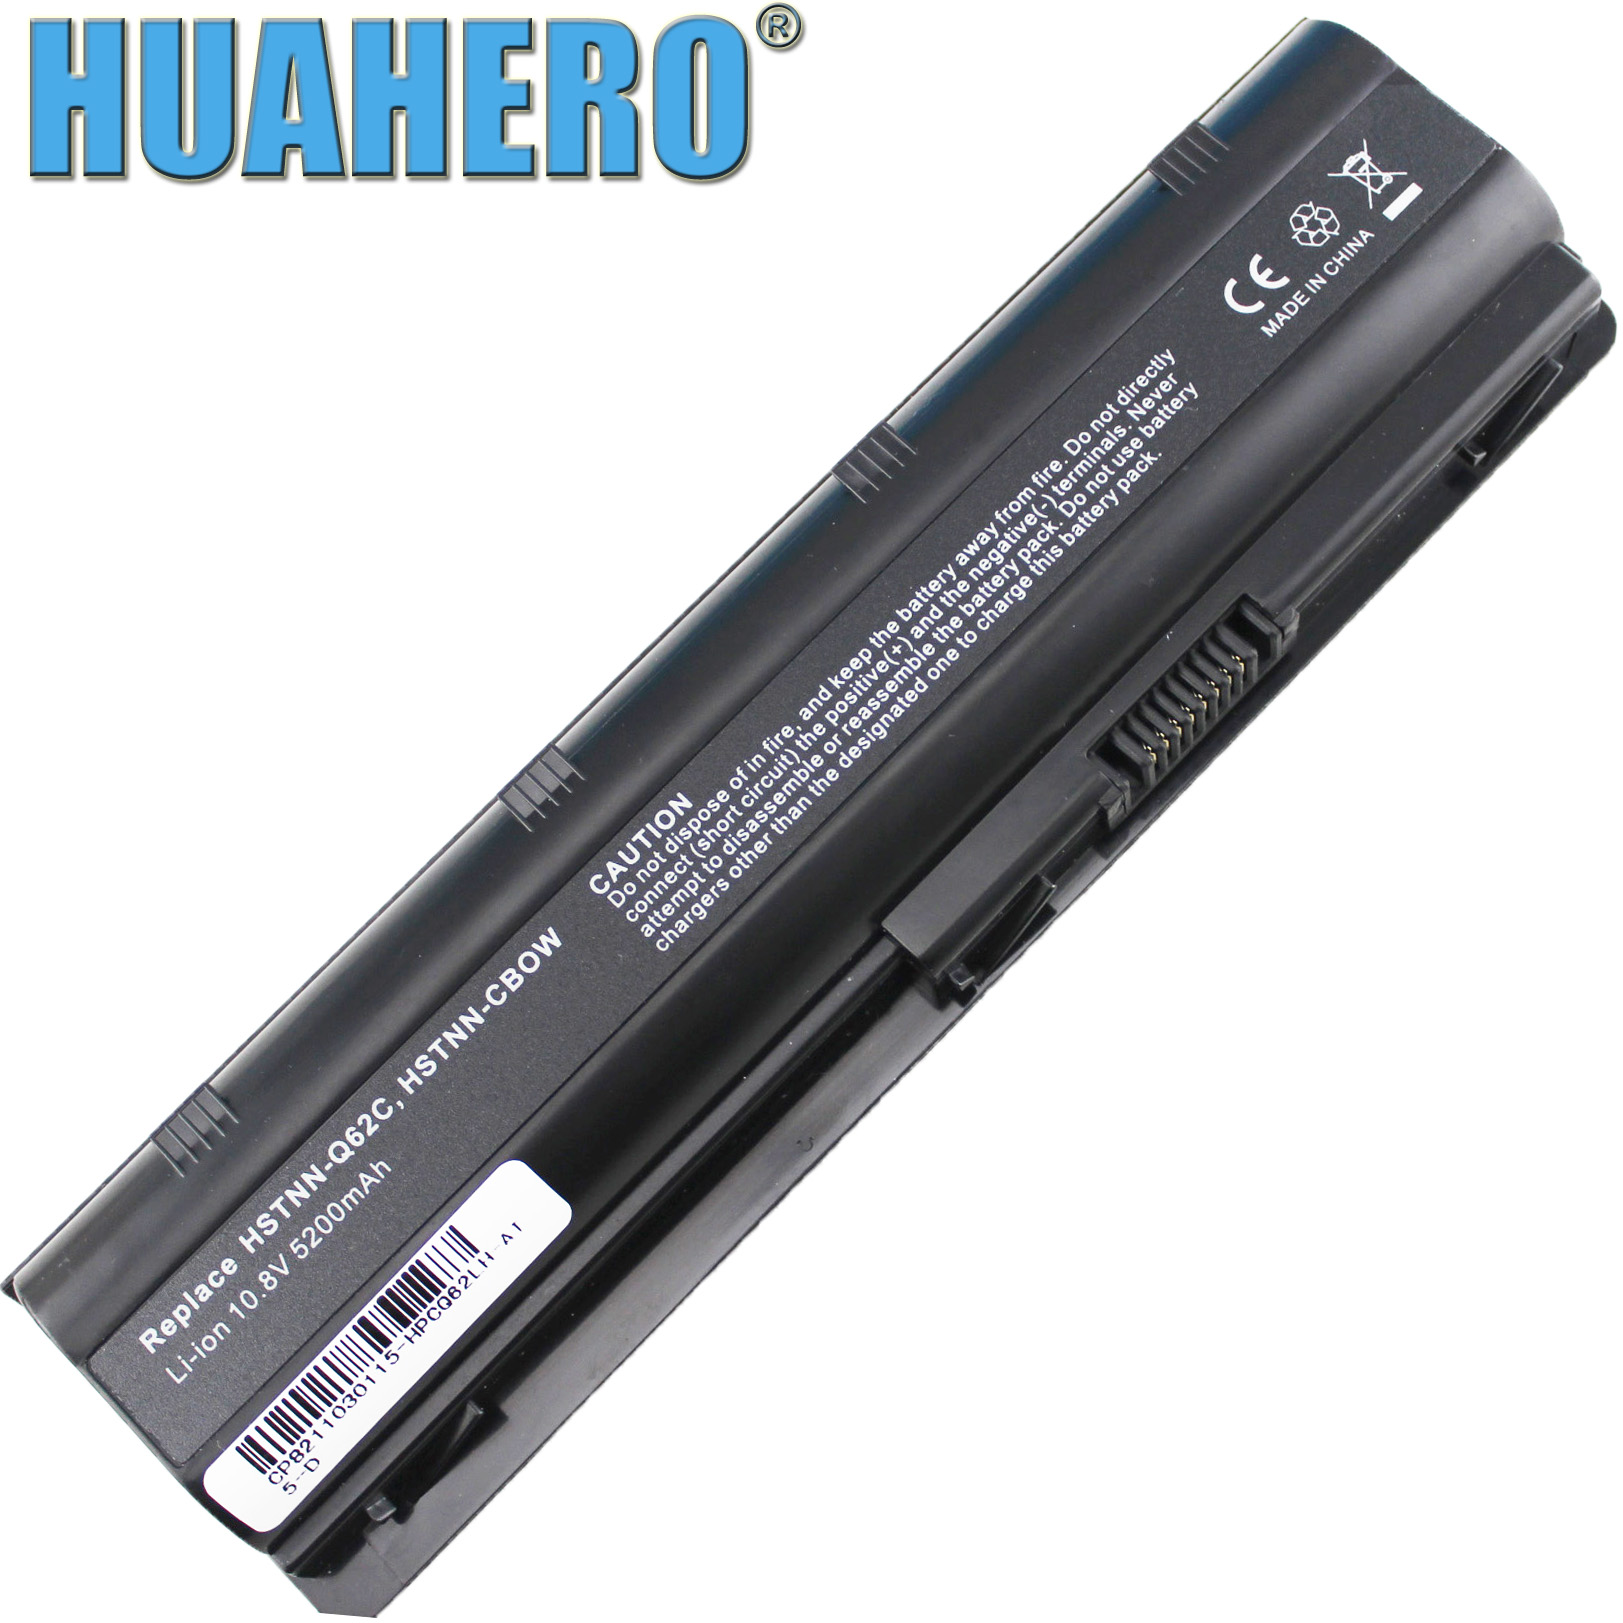 Аккумулятор HUAHERO MU06 593553-001 для ноутбука HP 2000-425NR CQ32 CQ42 CQ56 CQ62 CQ72 G32 G42 G56 G62 DM4 G72 CQ43 MU09 593554-001